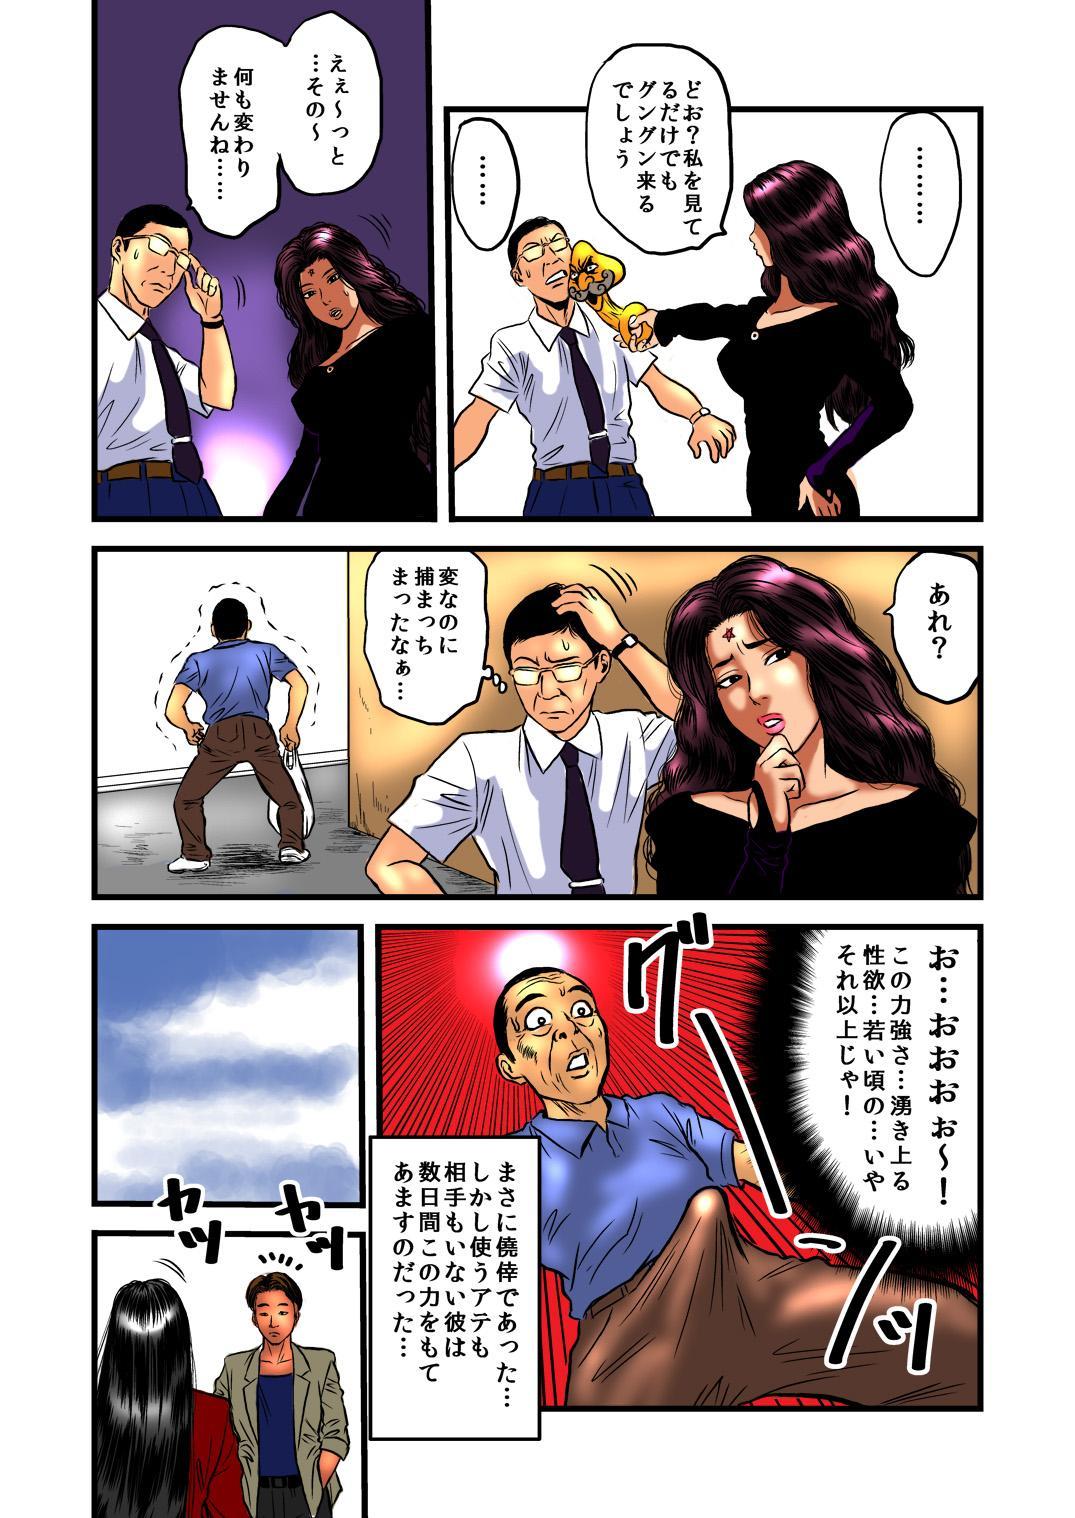 Ryoujoku no Katei Houmon ・ Zenpen 2